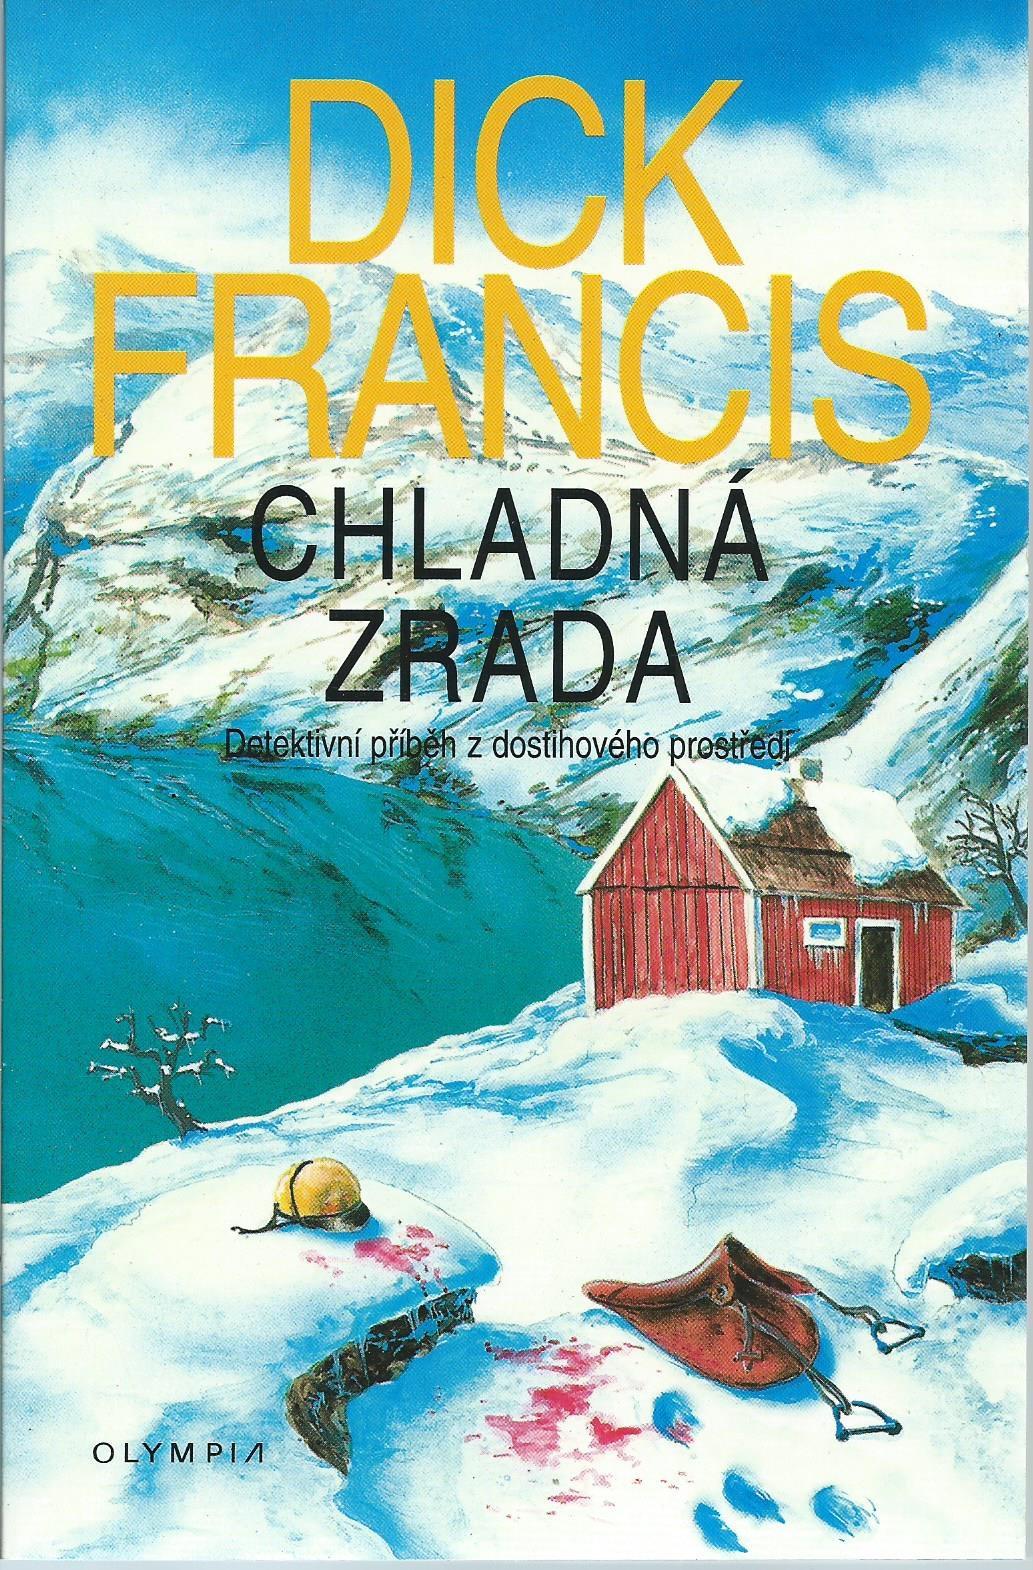 Výsledek obrázku pro dick francis chladná zrada